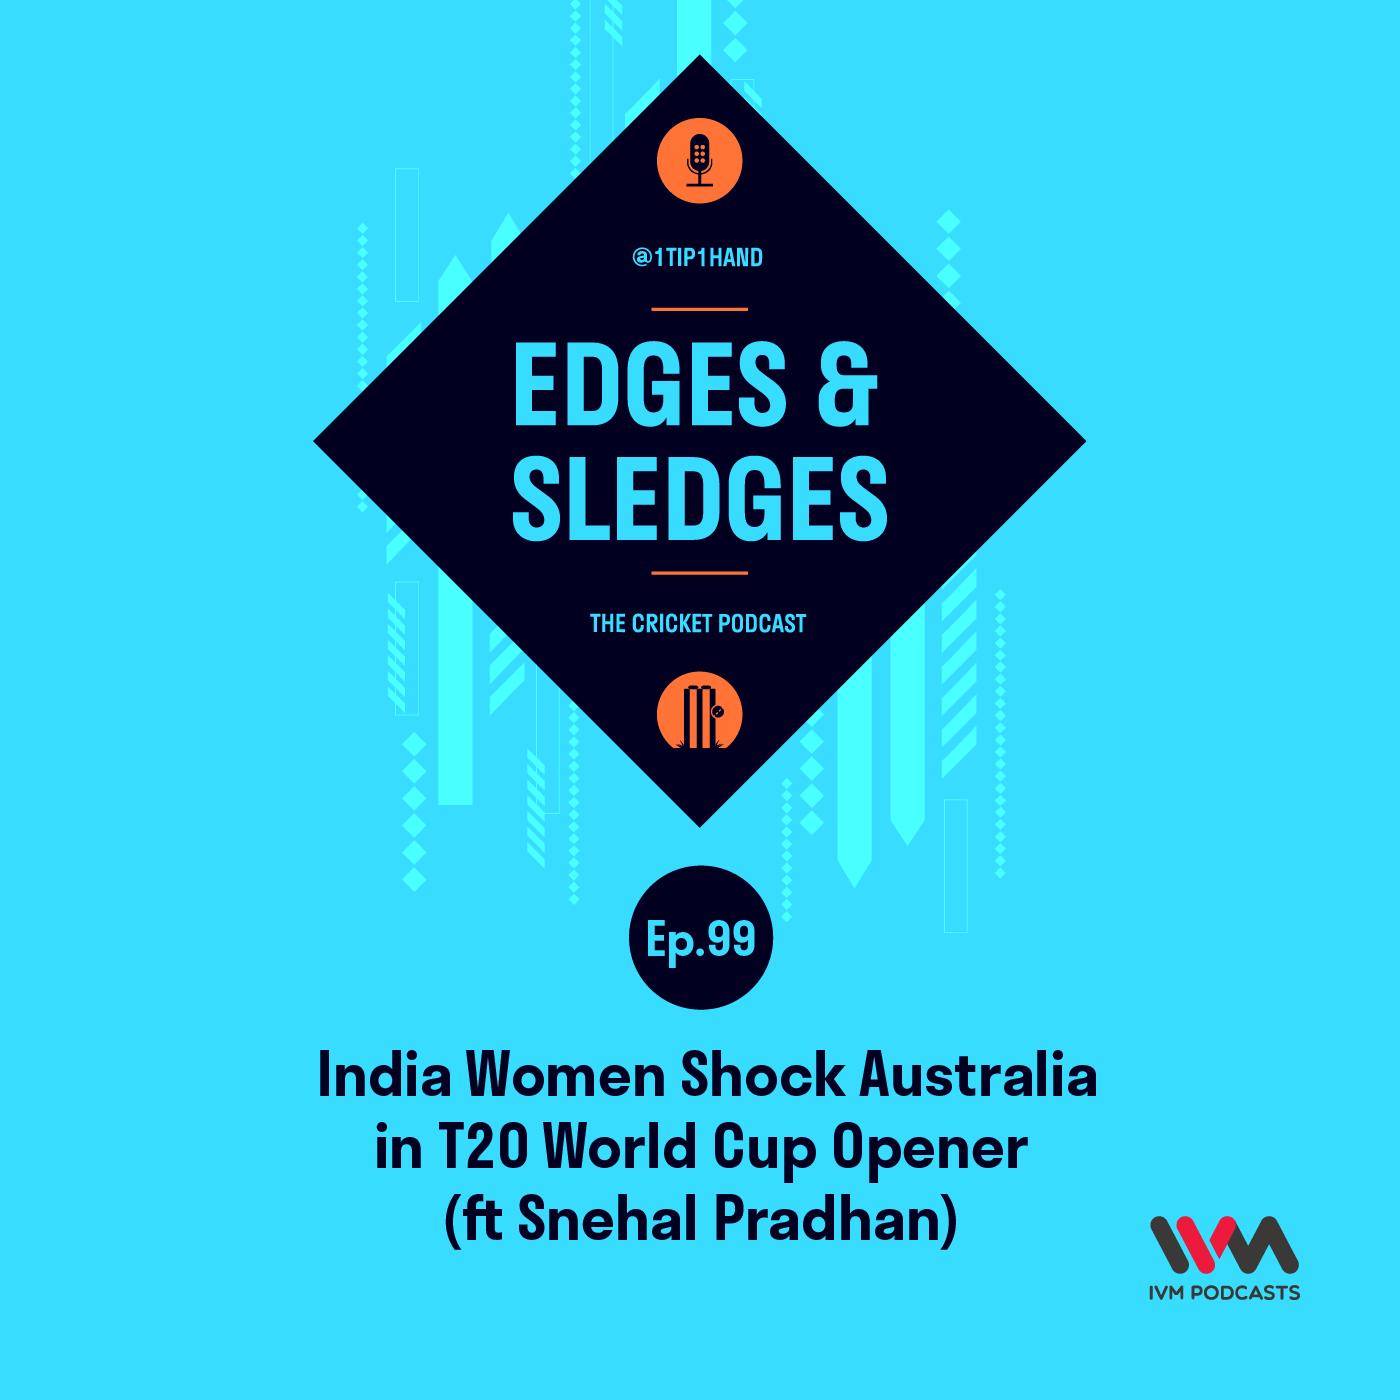 Ep. 99: India Women Shock Australia in T20 World Cup Opener (ft Snehal Pradhan)